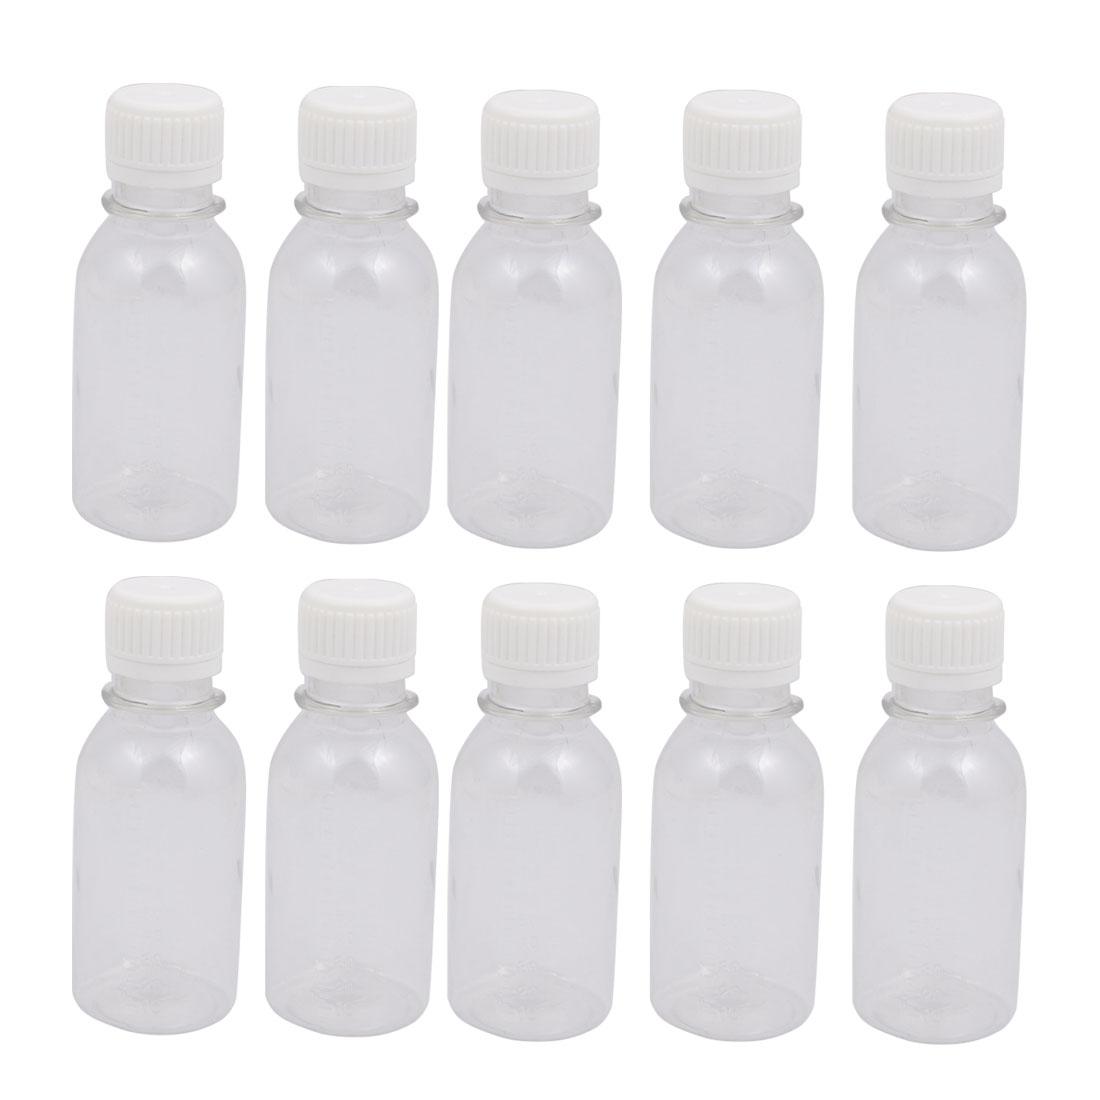 10Pcs 100ml Plastic Bottle Transparent DIY Round Bottle w White Cover